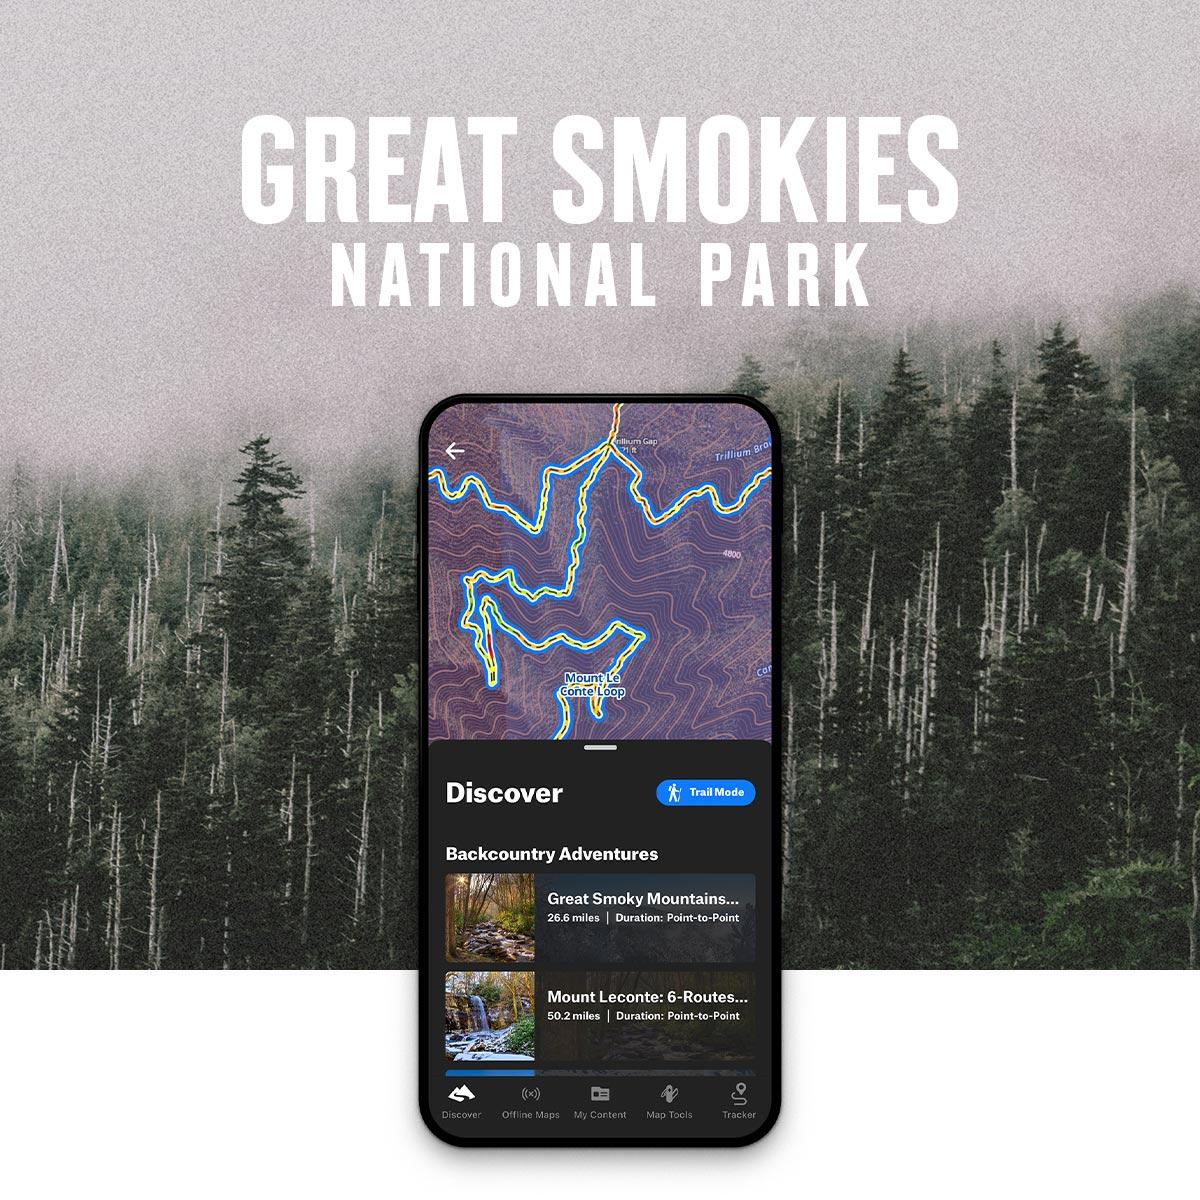 National Park GSMNP